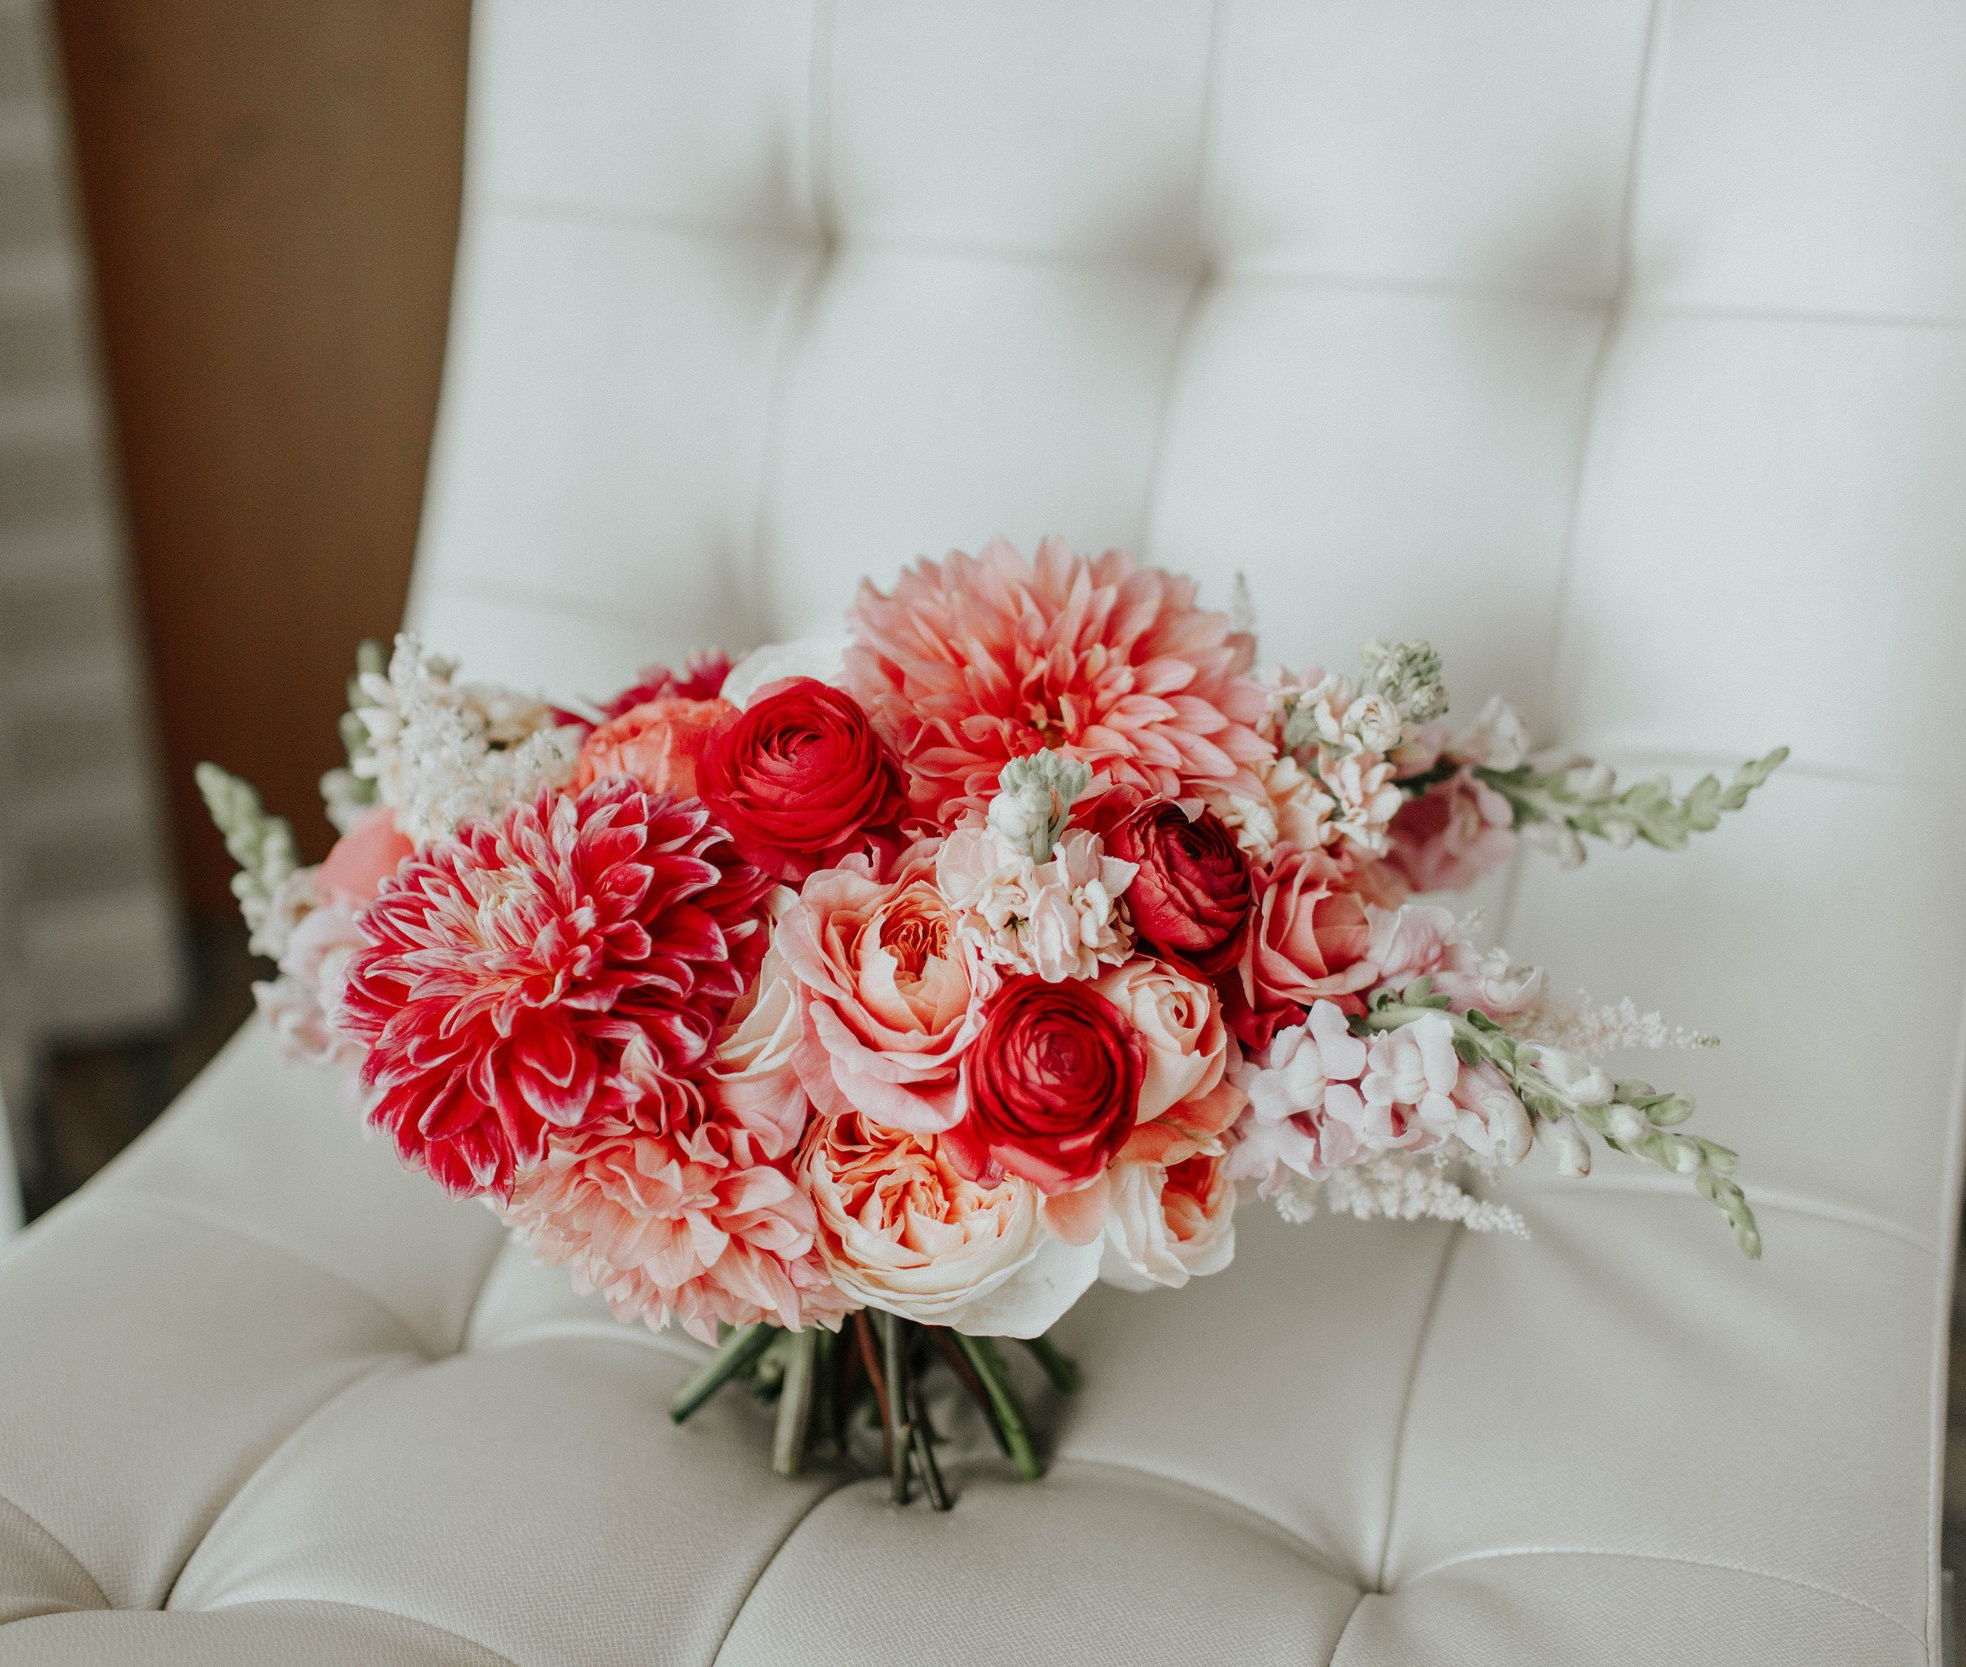 Living_Coral_Bouquet_Sibyl_Sophia_Des_Moines_Iowa.jpg